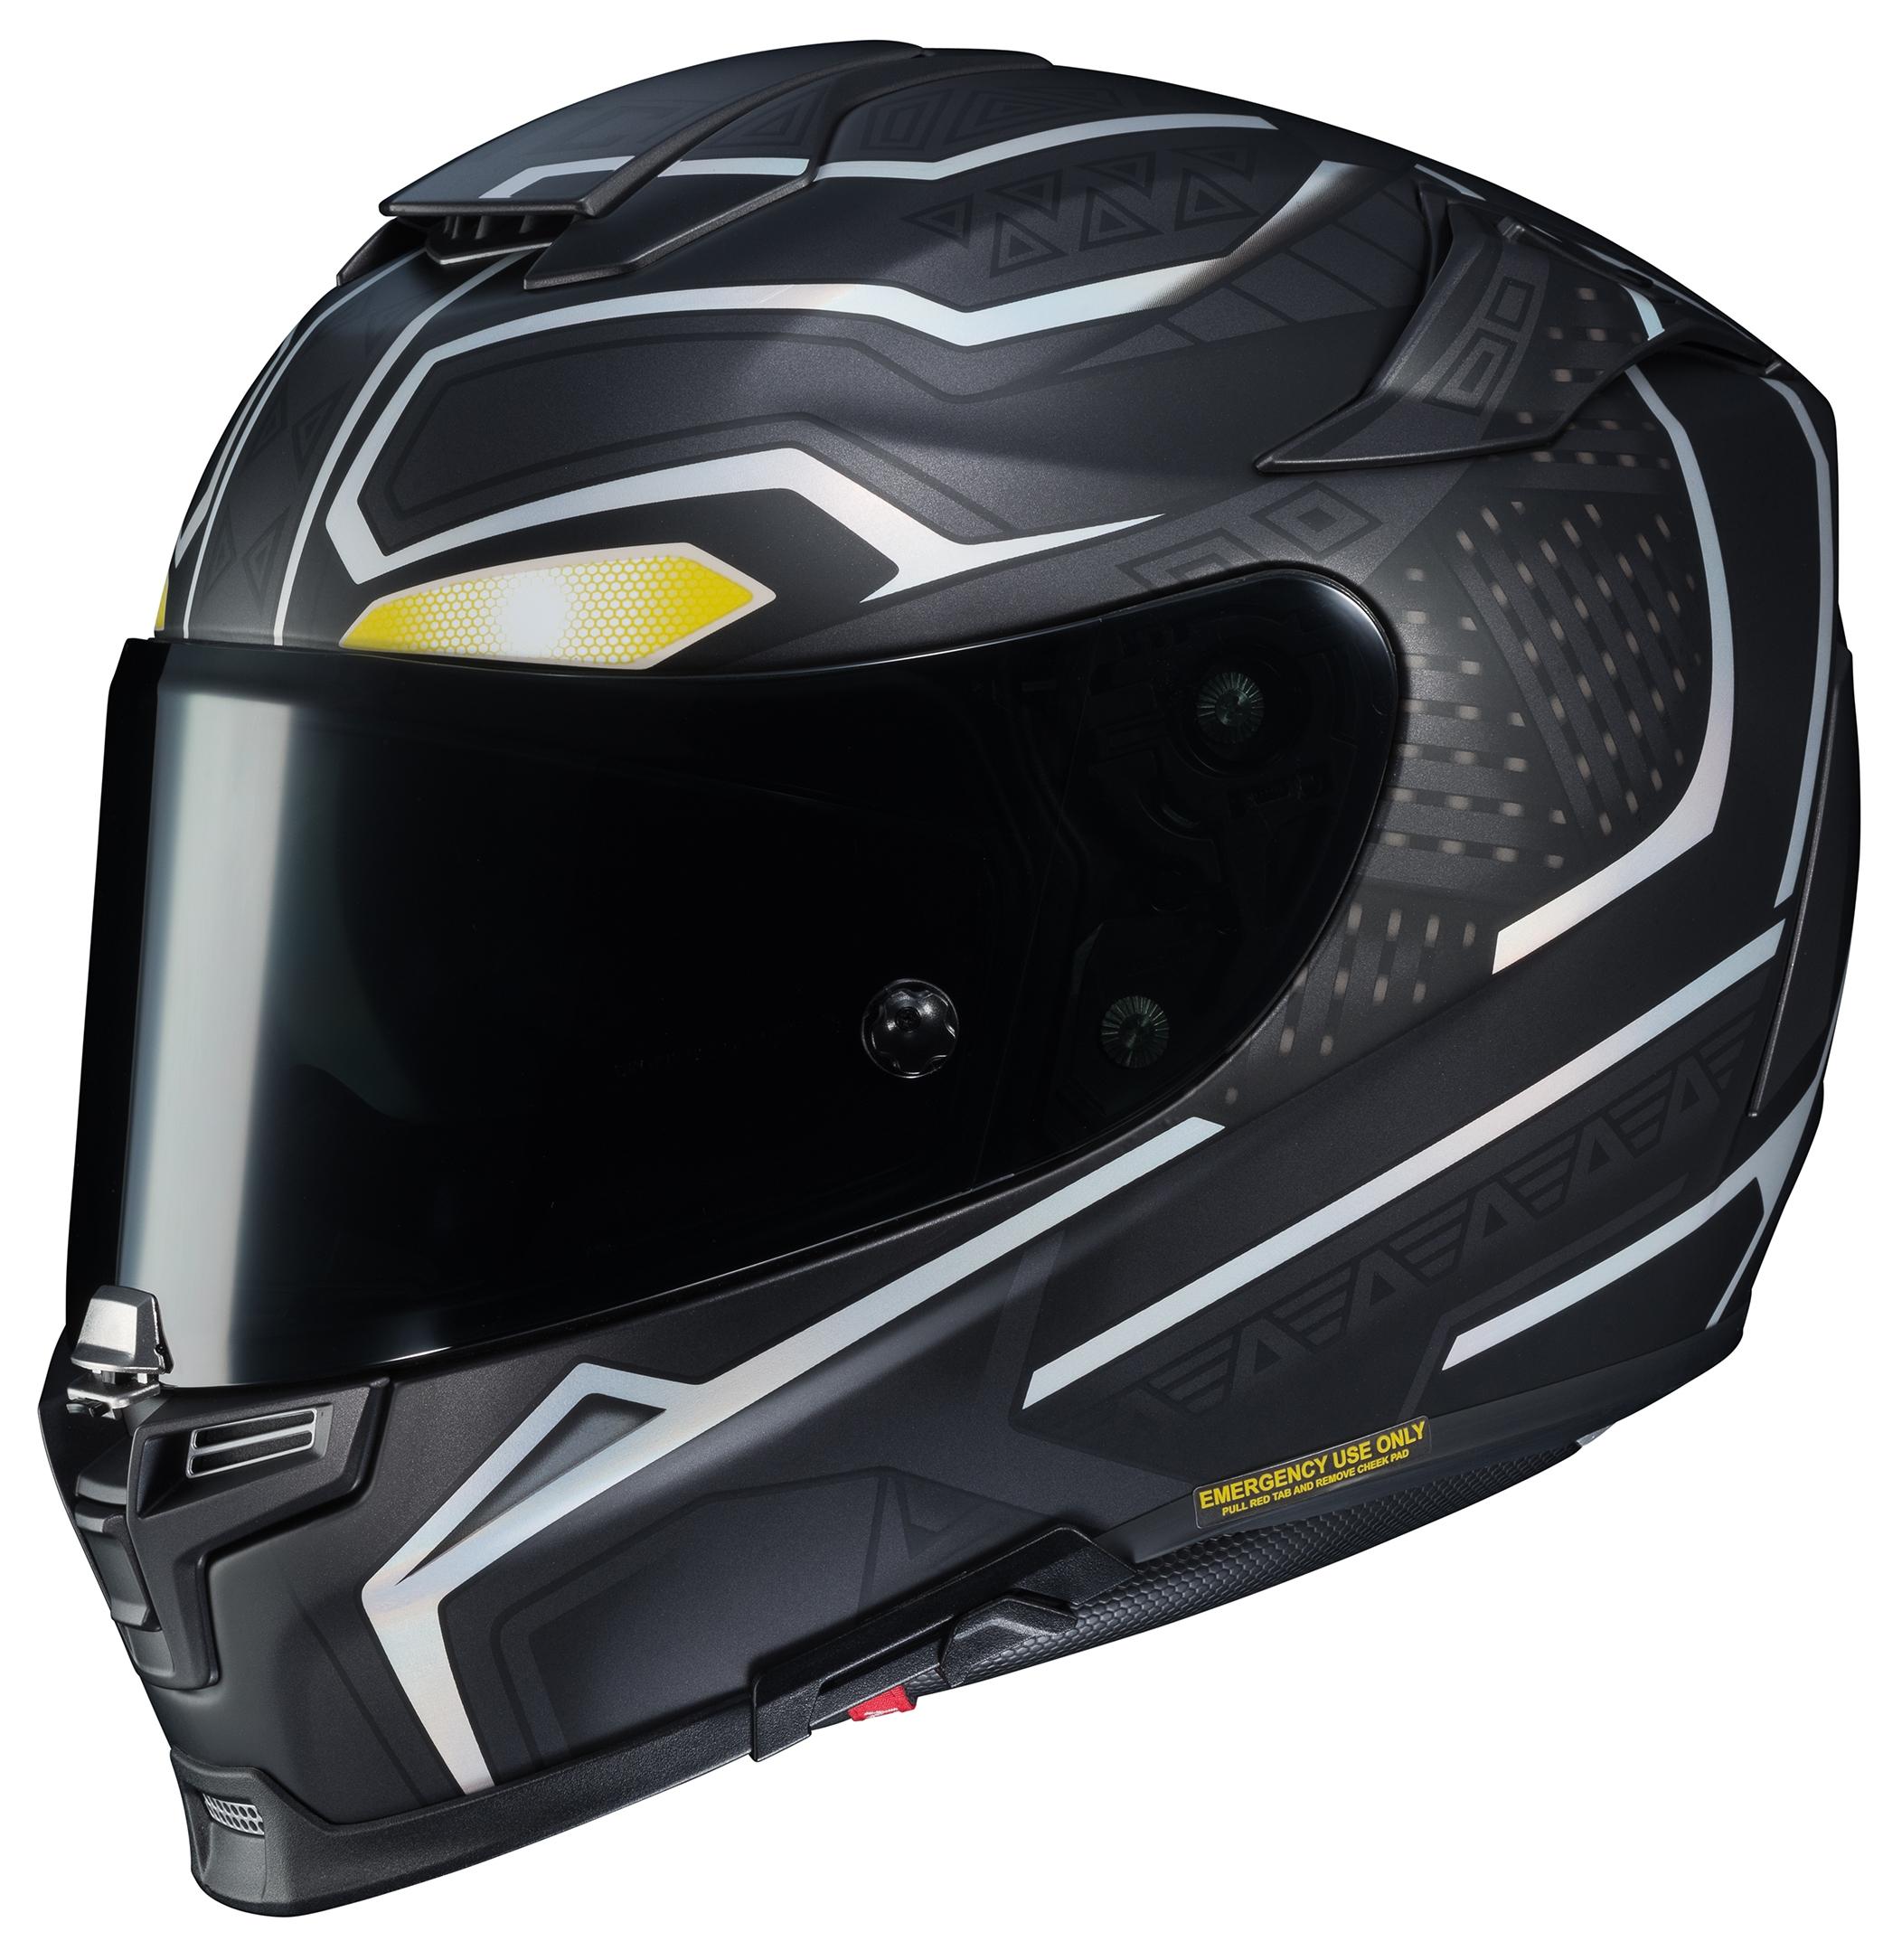 3a66ba8f HJC RPHA 70 ST Black Panther Helmet | 20% ($122.00) Off! - RevZilla